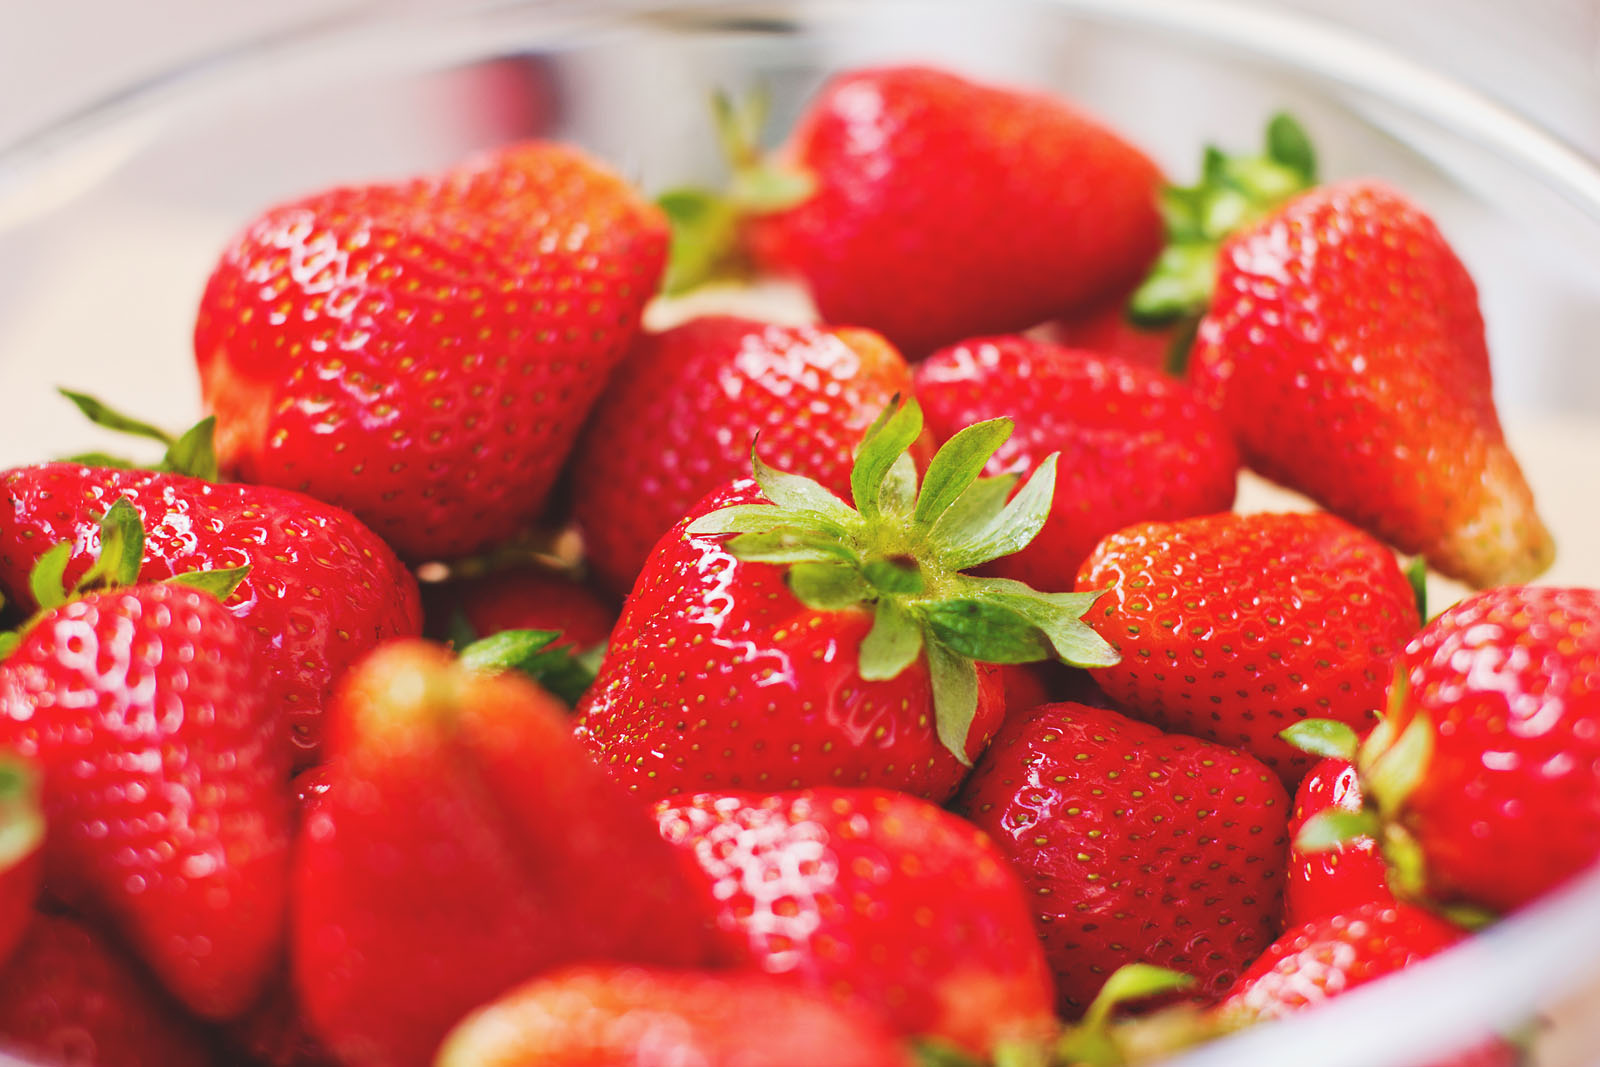 apples good for teeth strawberries